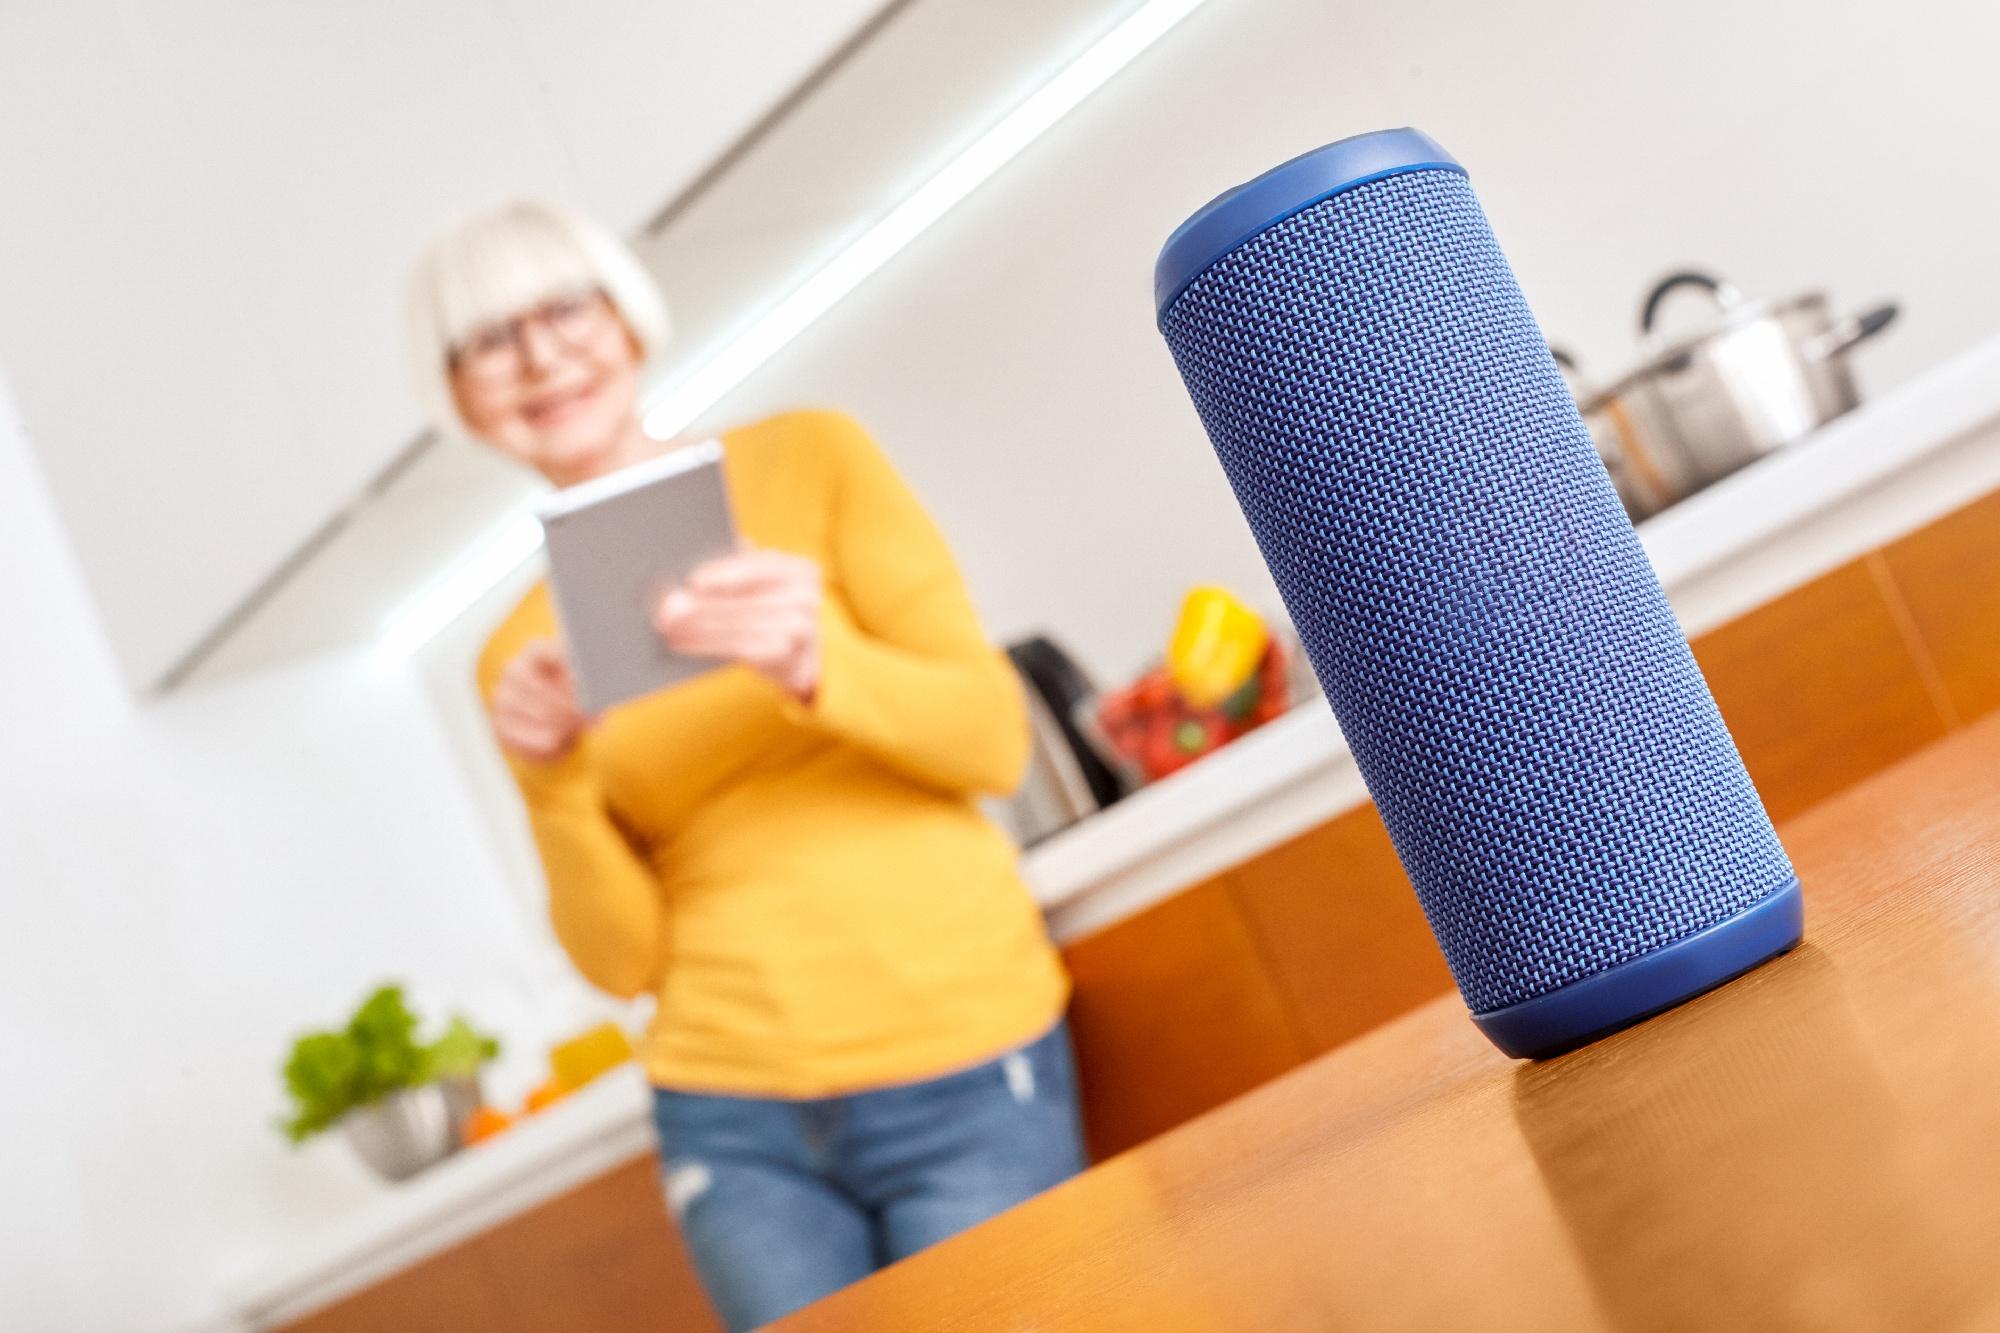 senior woman using smart speaker at home